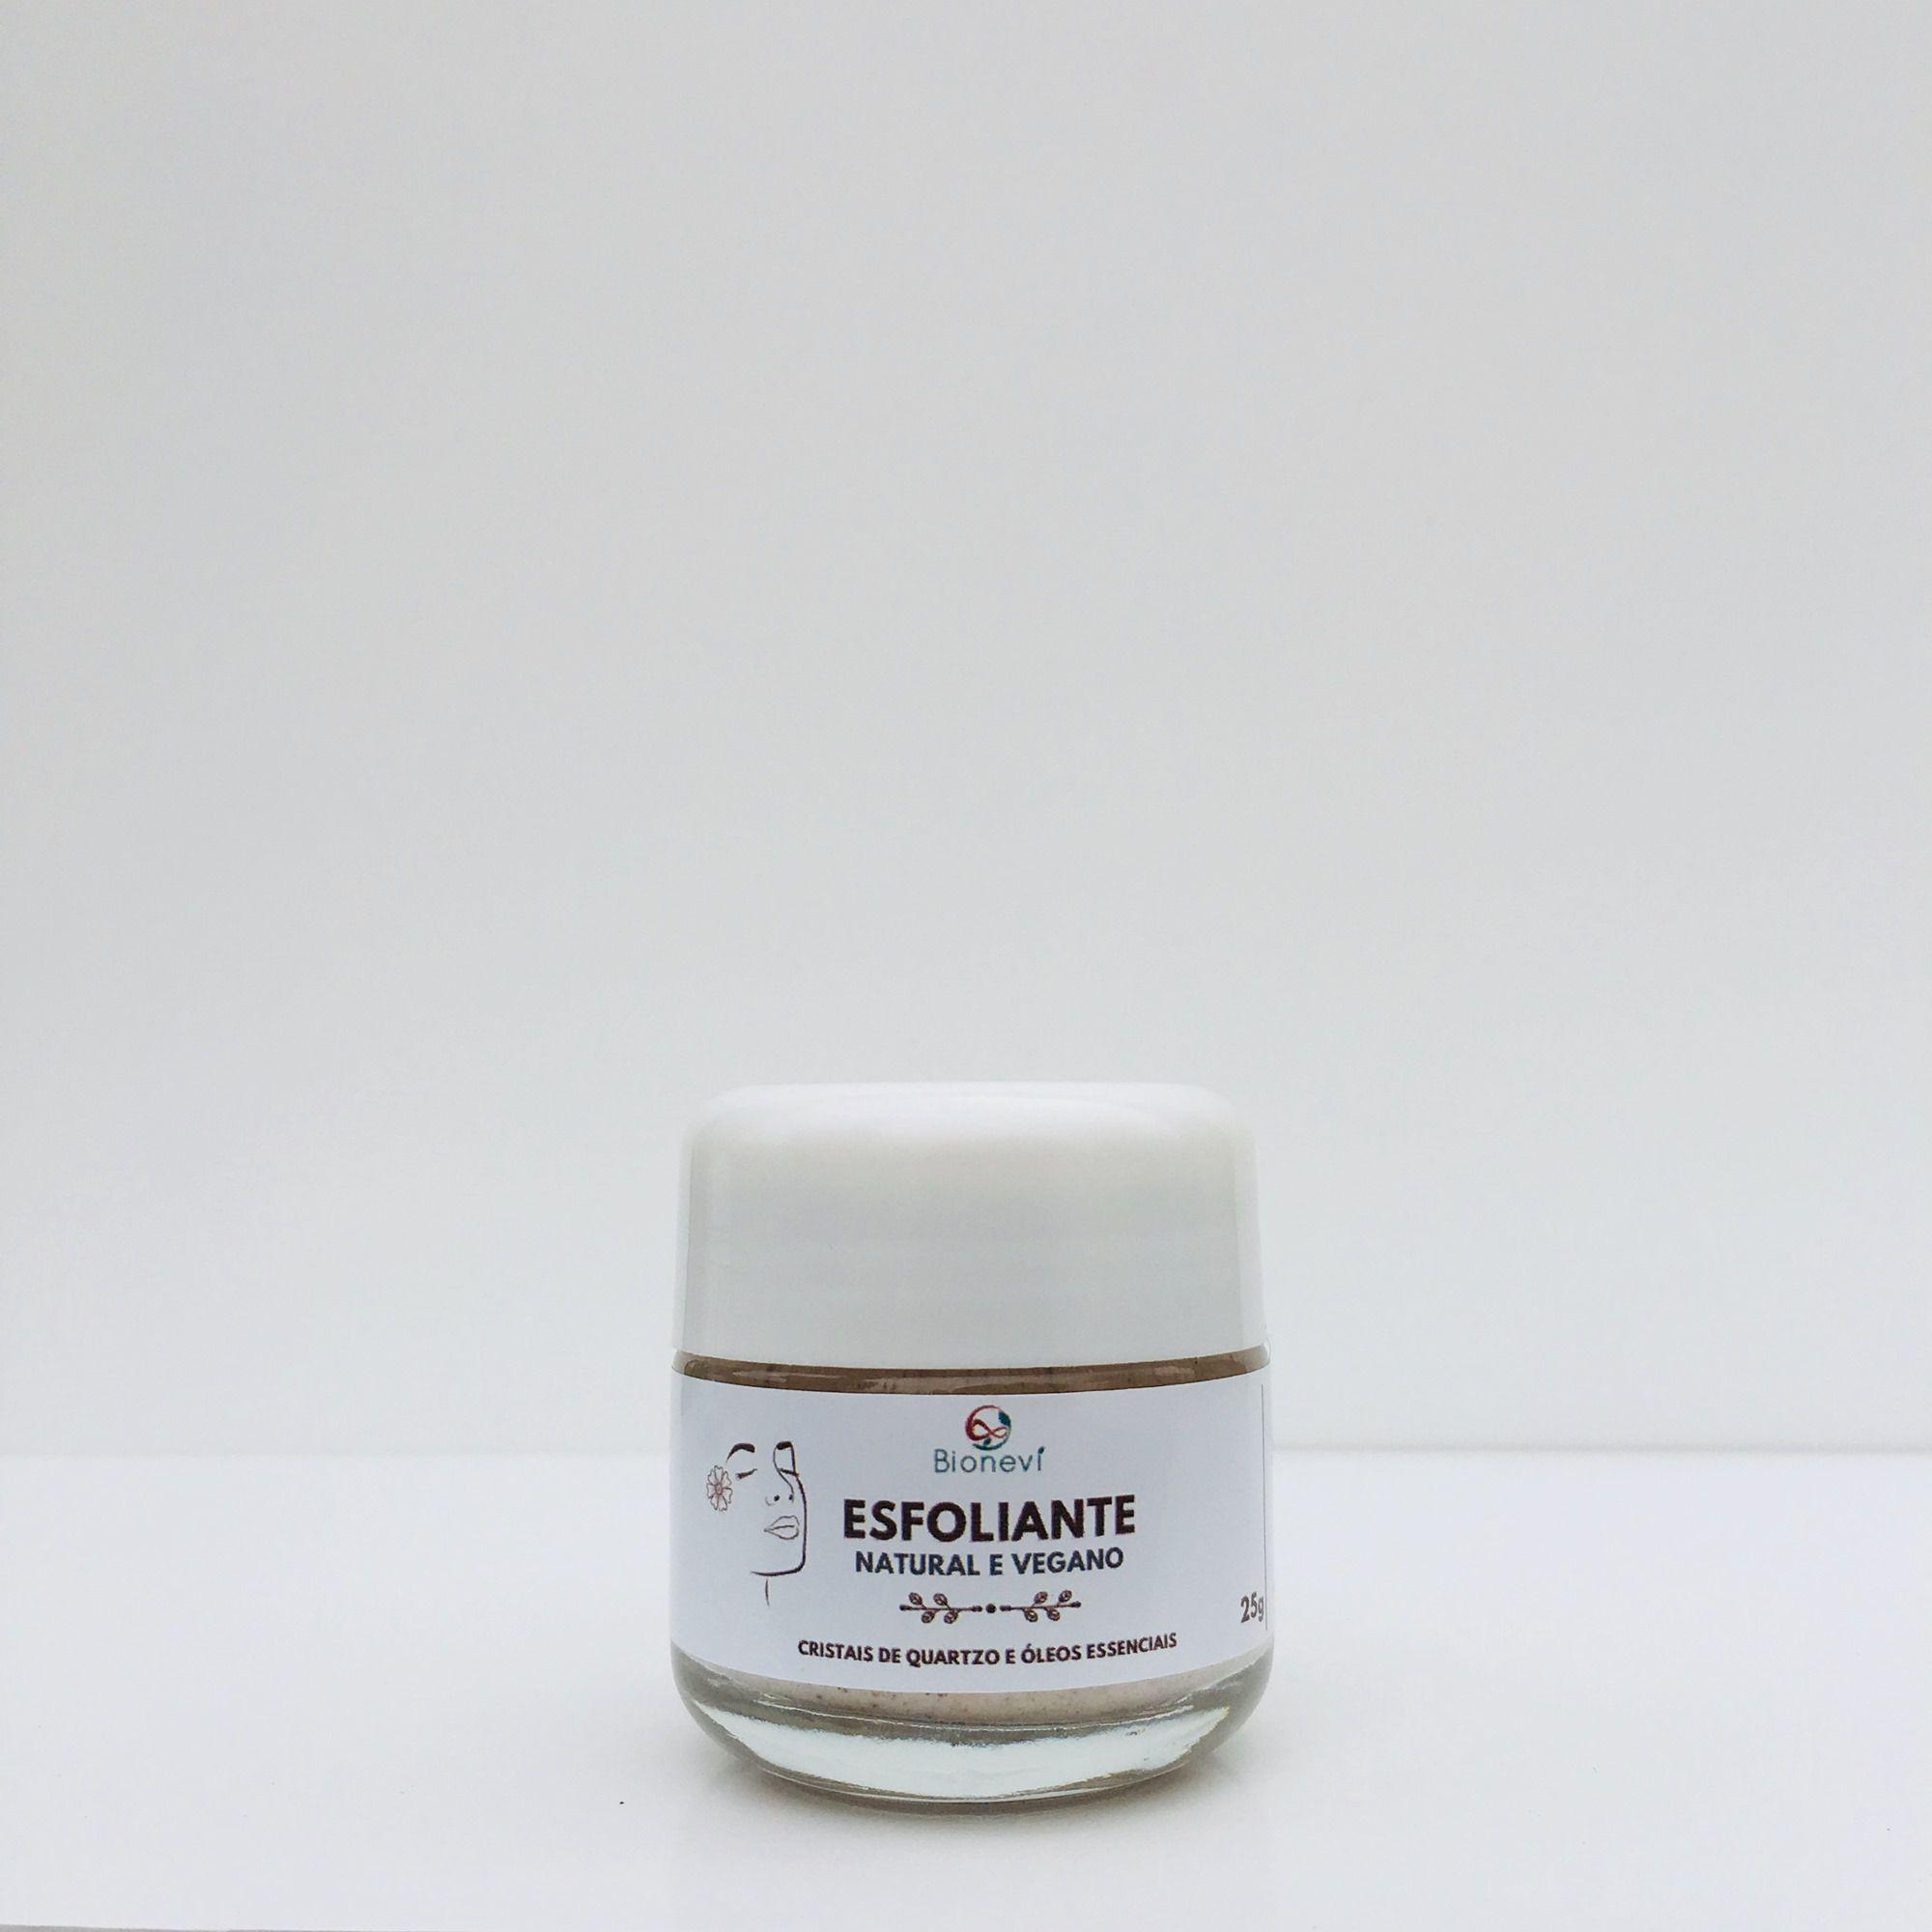 ESFOLIANTE NATURAL 25G